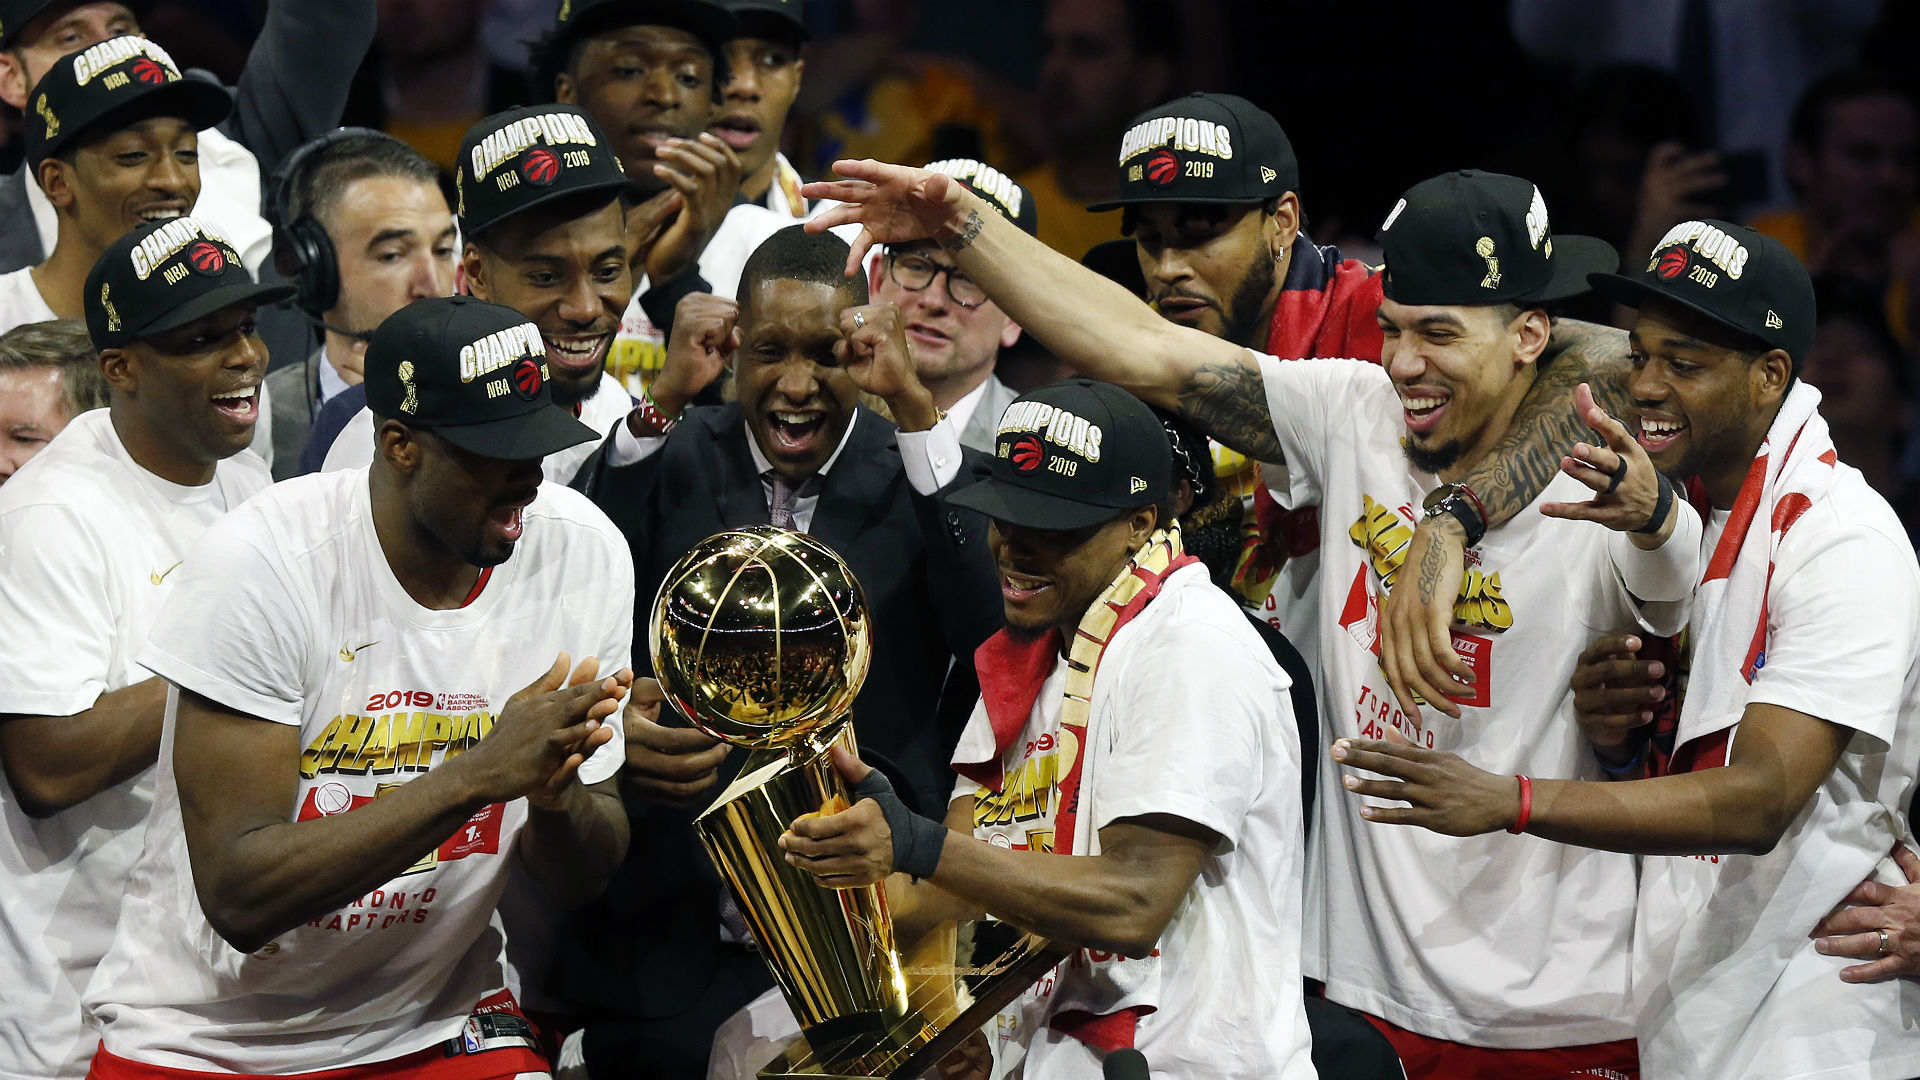 Toronto Raptors Nba Champions Wallpapers: NBA Finals: 7 Key Stats From Raptors' Championship Run